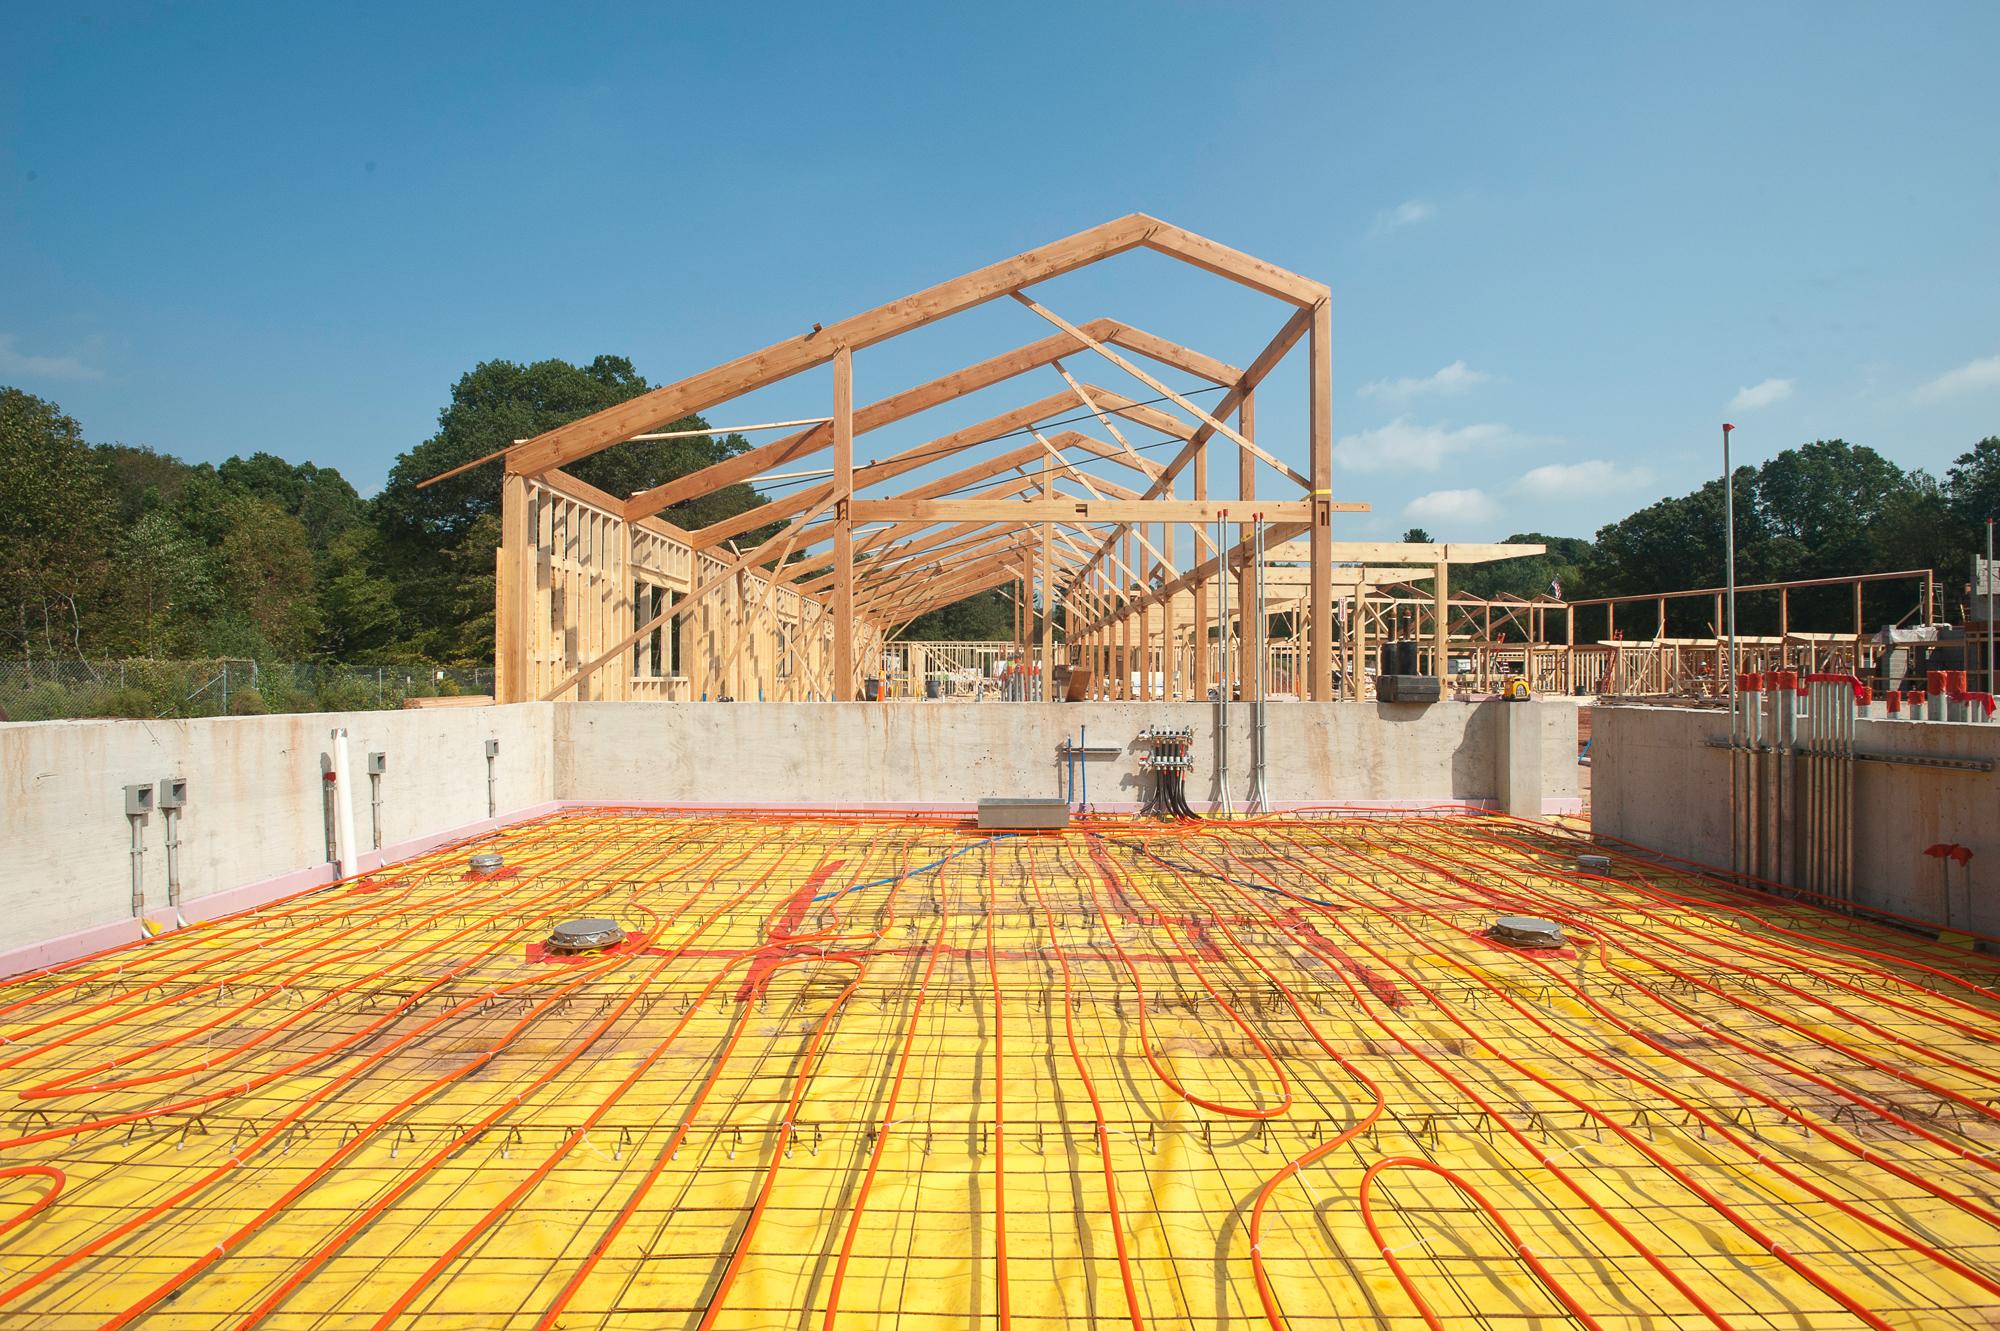 radiant heat construction and progress photo by John giammatteo of Kohler Environmental Center